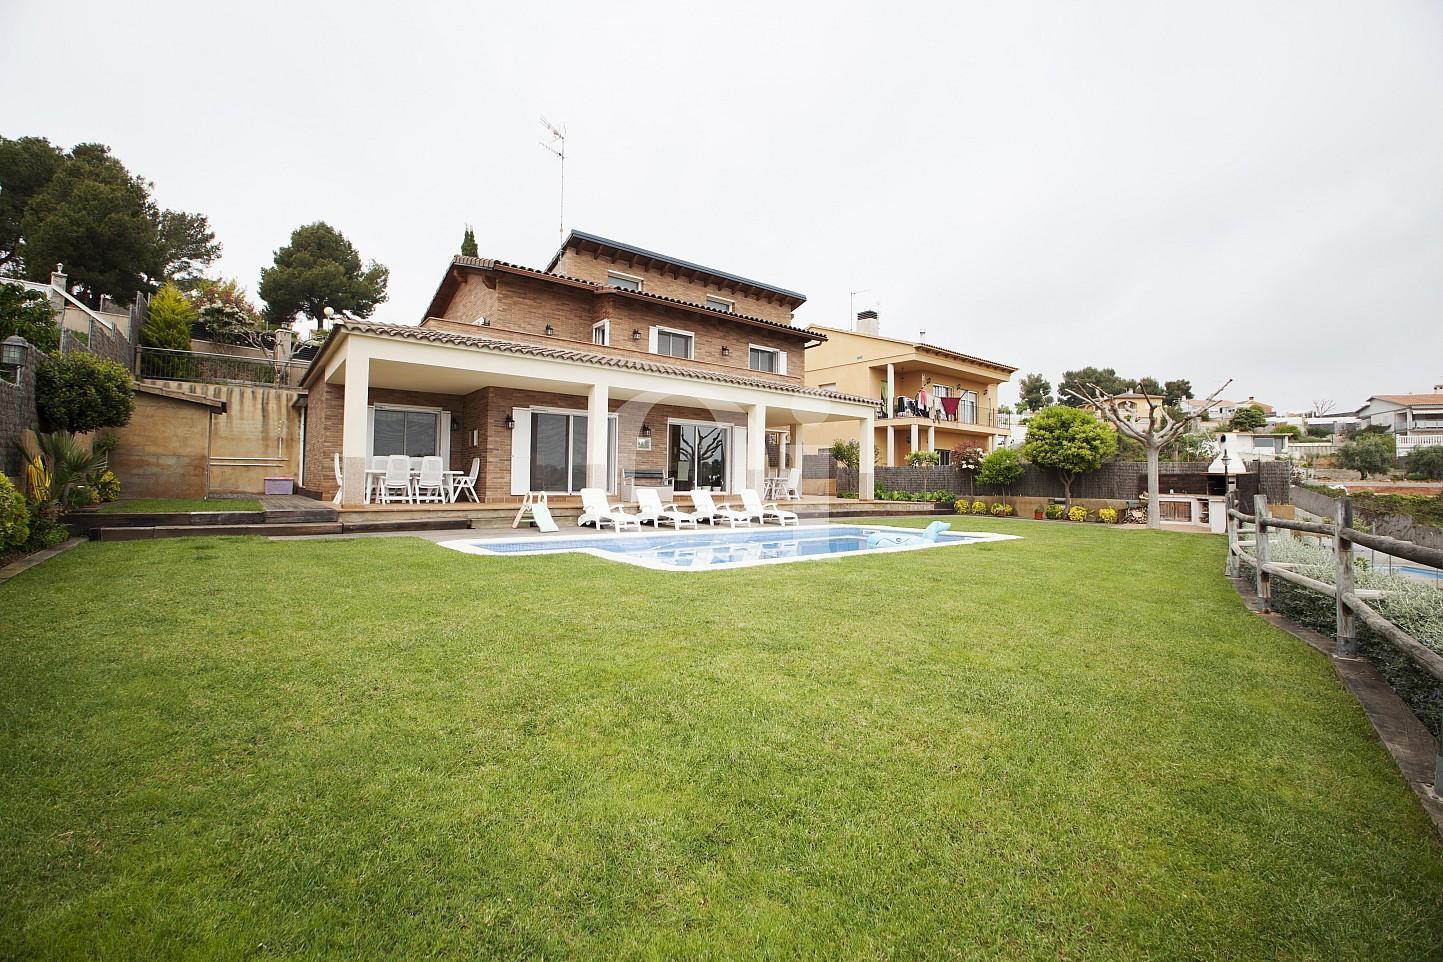 Views of fantastic house for sale in Segur de Calafell, Tarragona